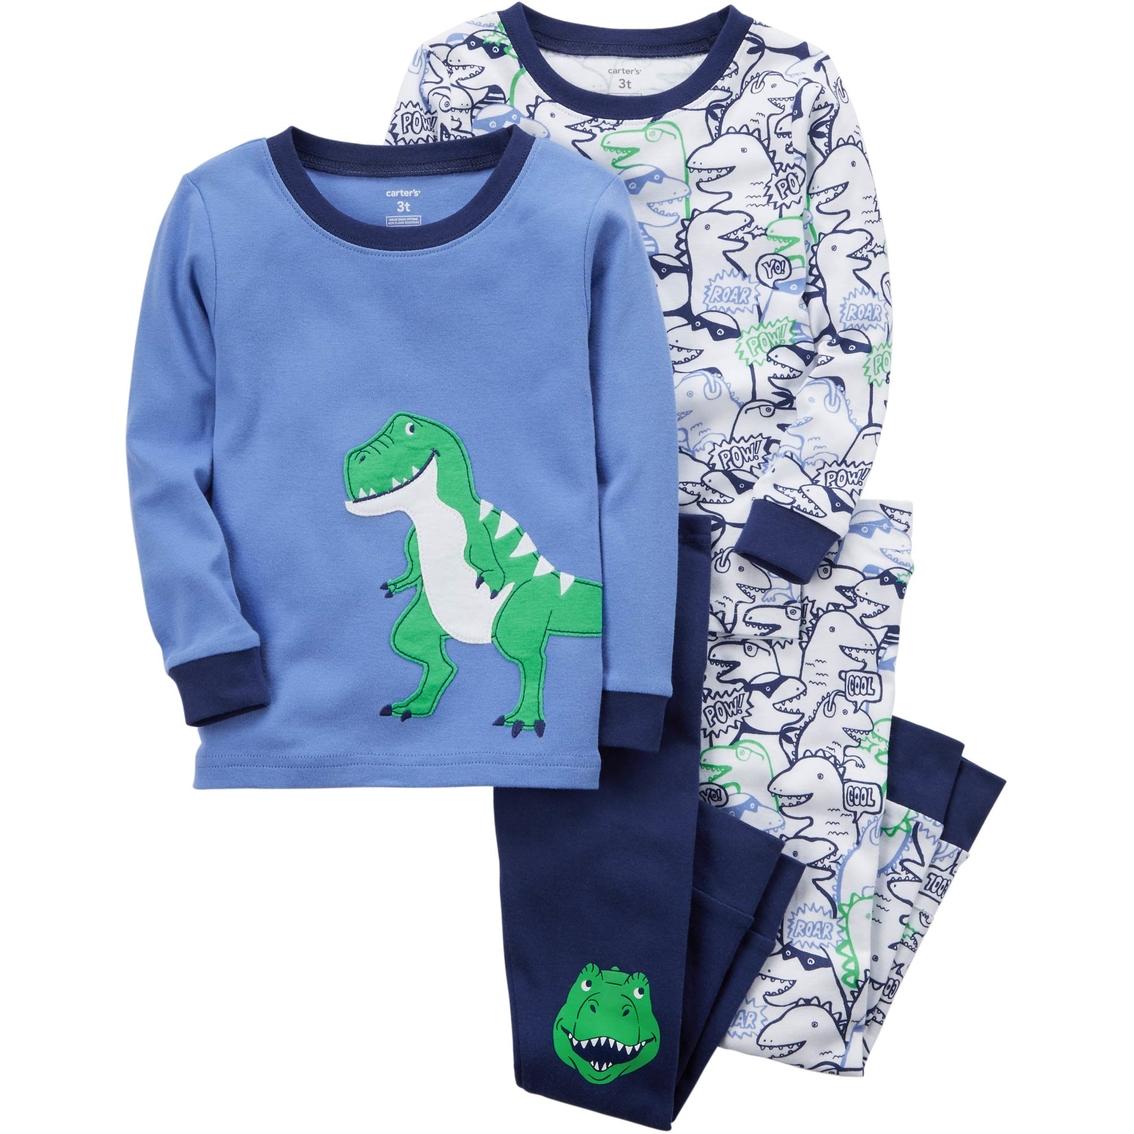 11cf7cba5 Carter s Infant Boys 4 Pc. Dinosaur Pajama Set